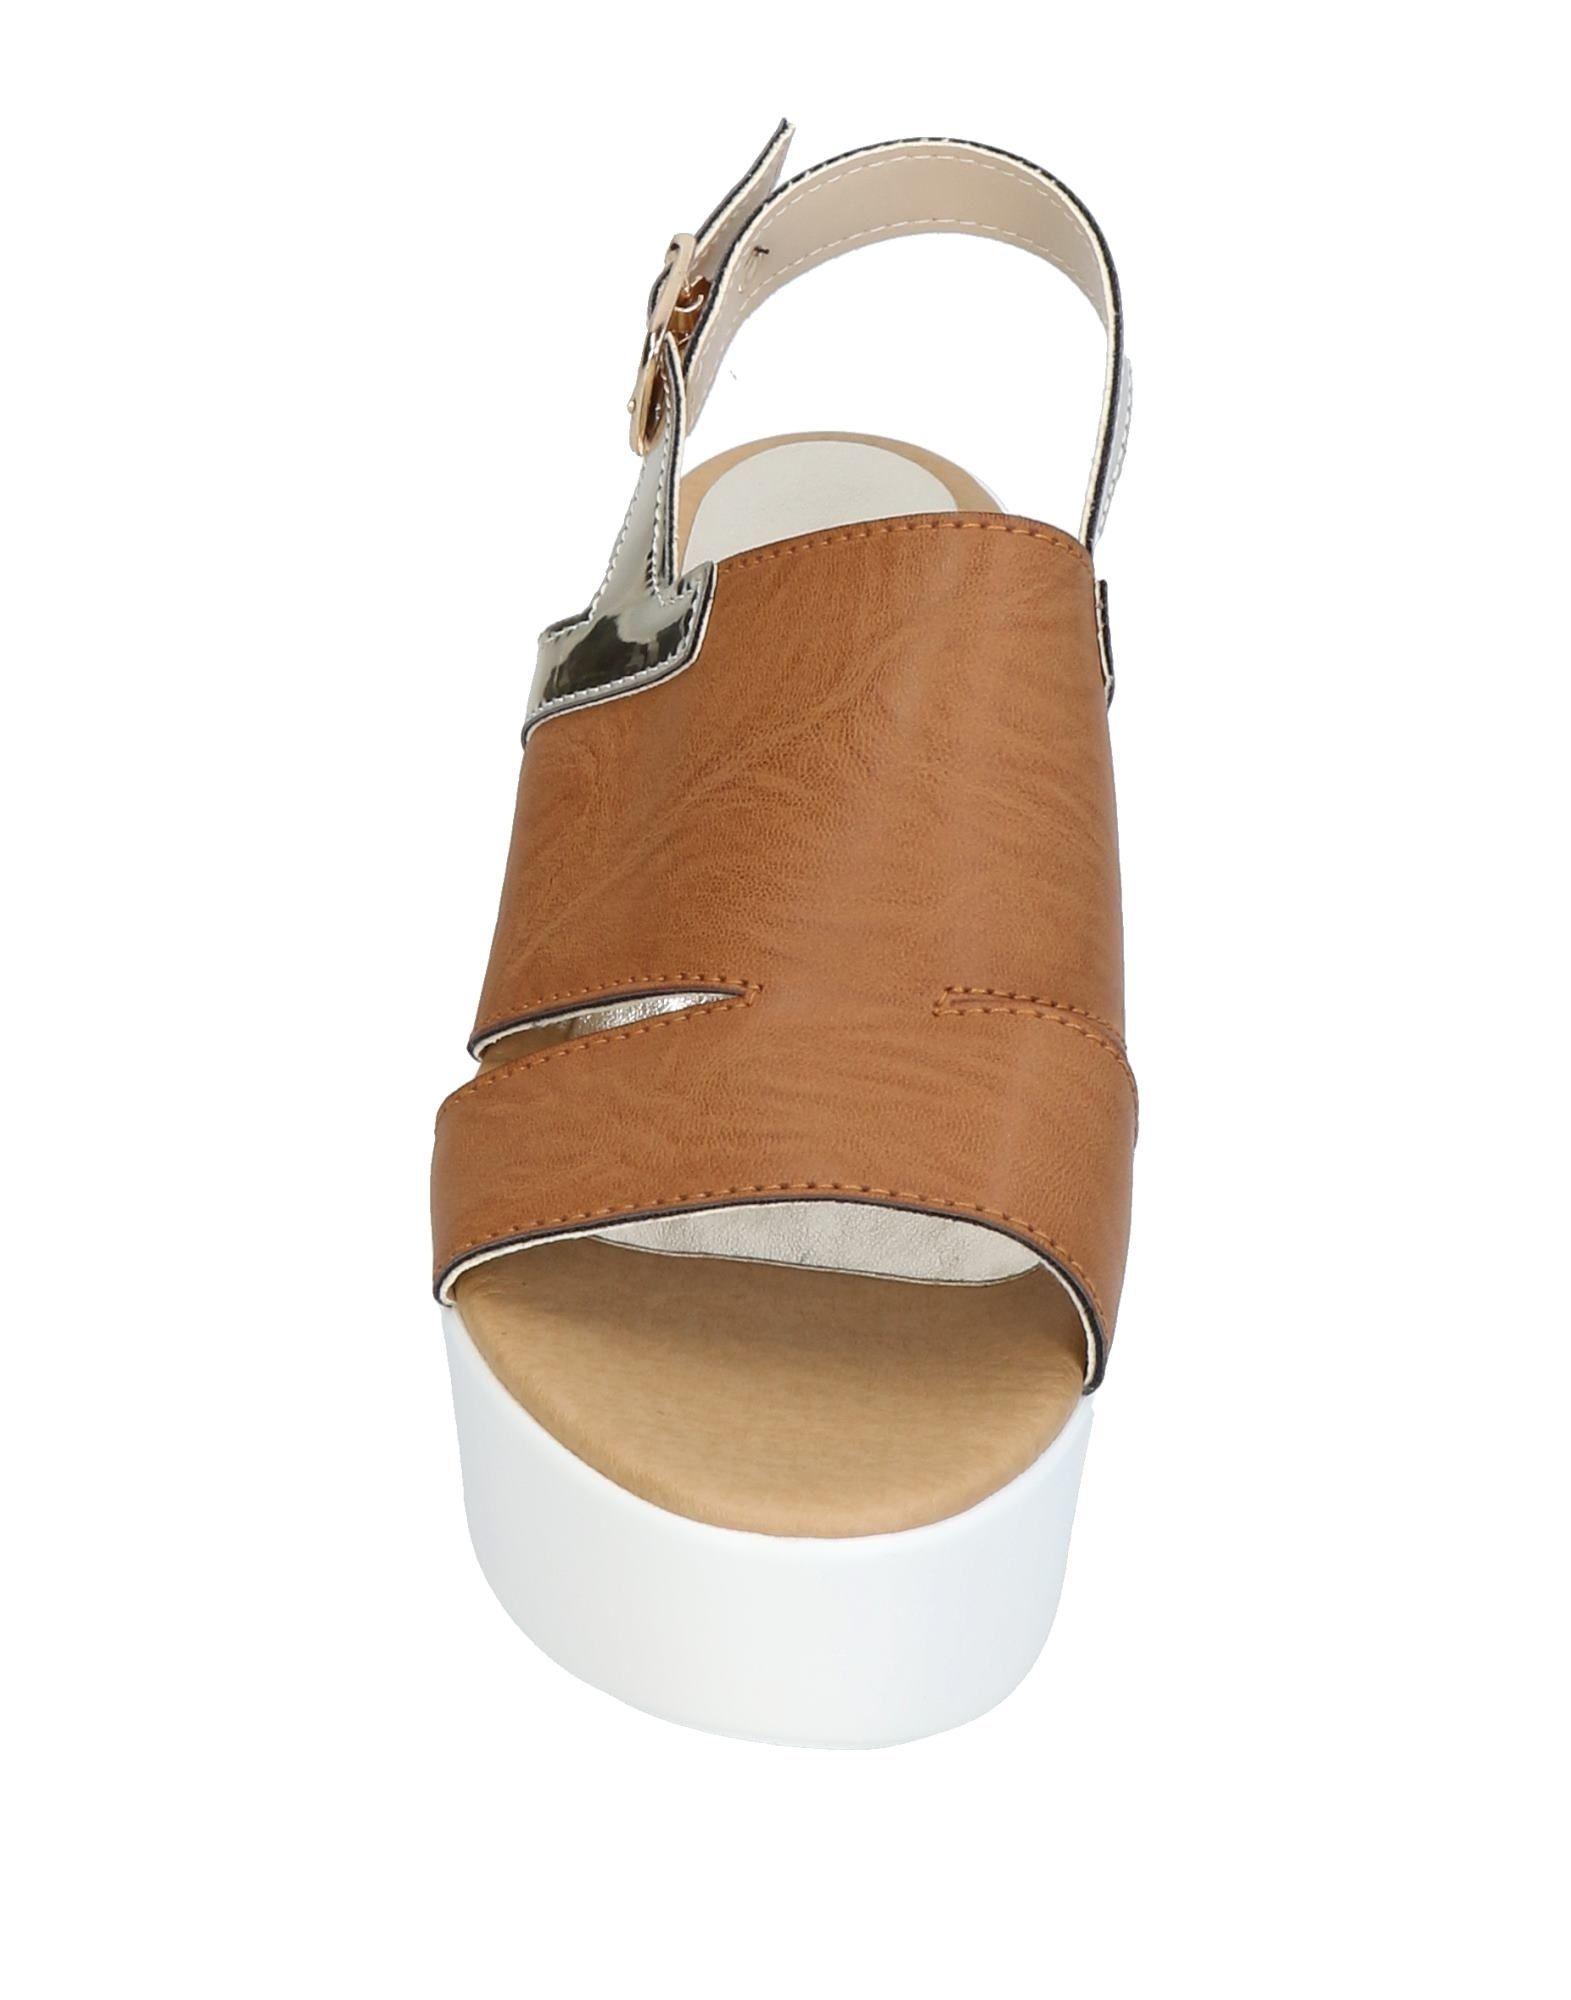 Angela Schuhe George Sandalen Damen  11460201PQ Gute Qualität beliebte Schuhe Angela a14c63